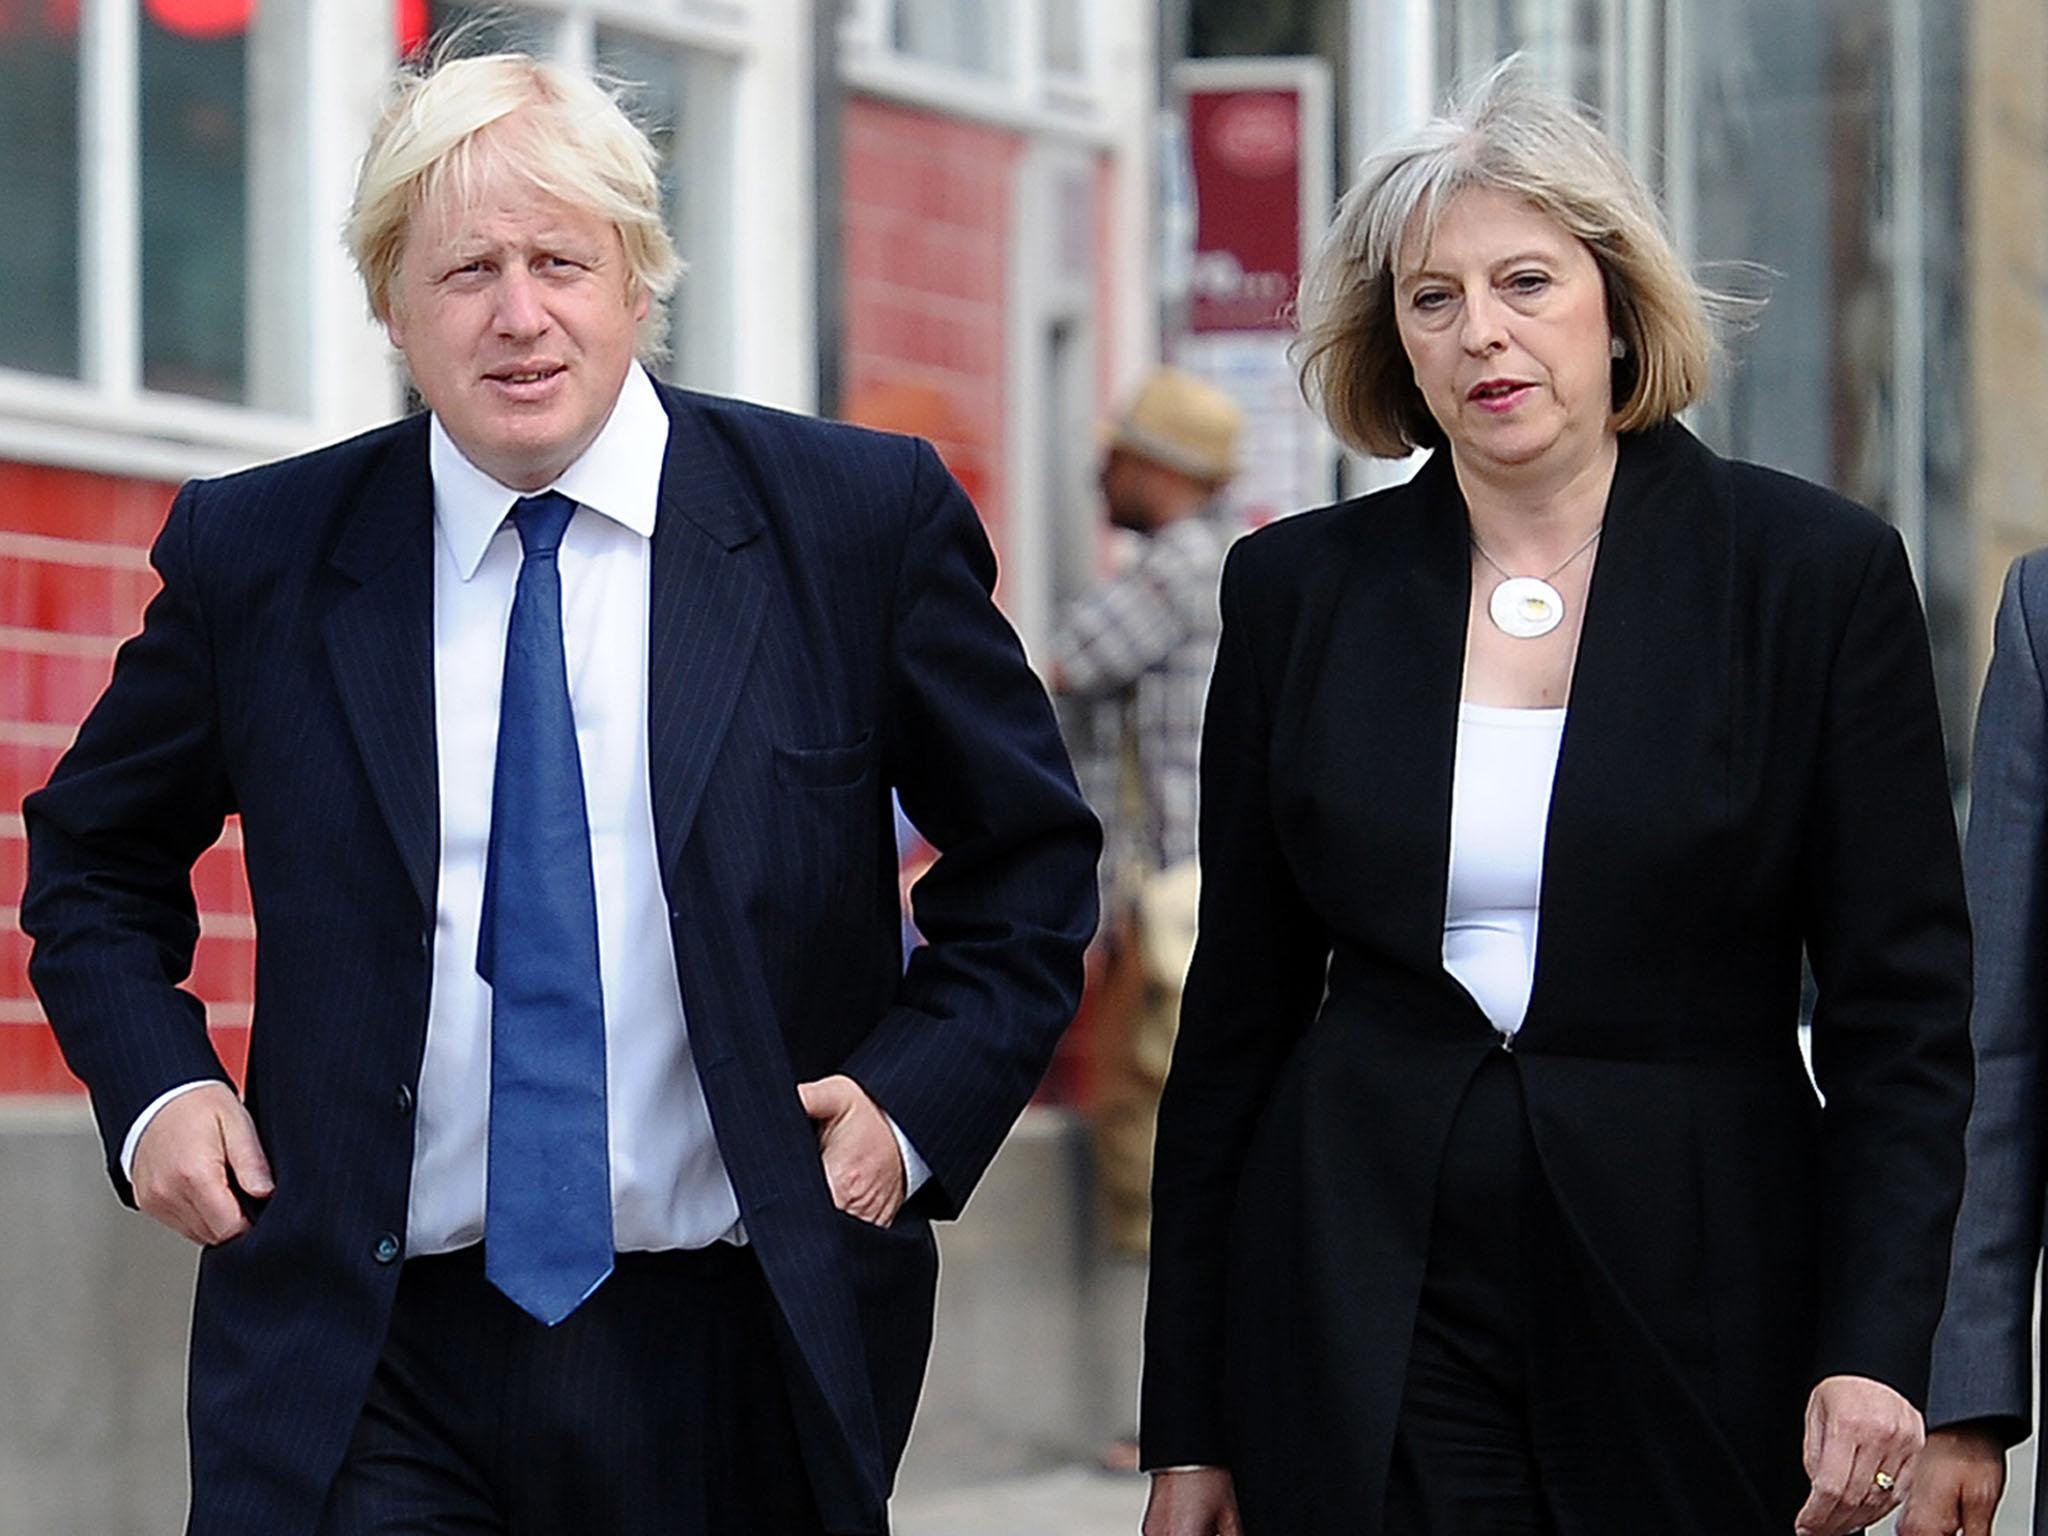 Boris and Theresa